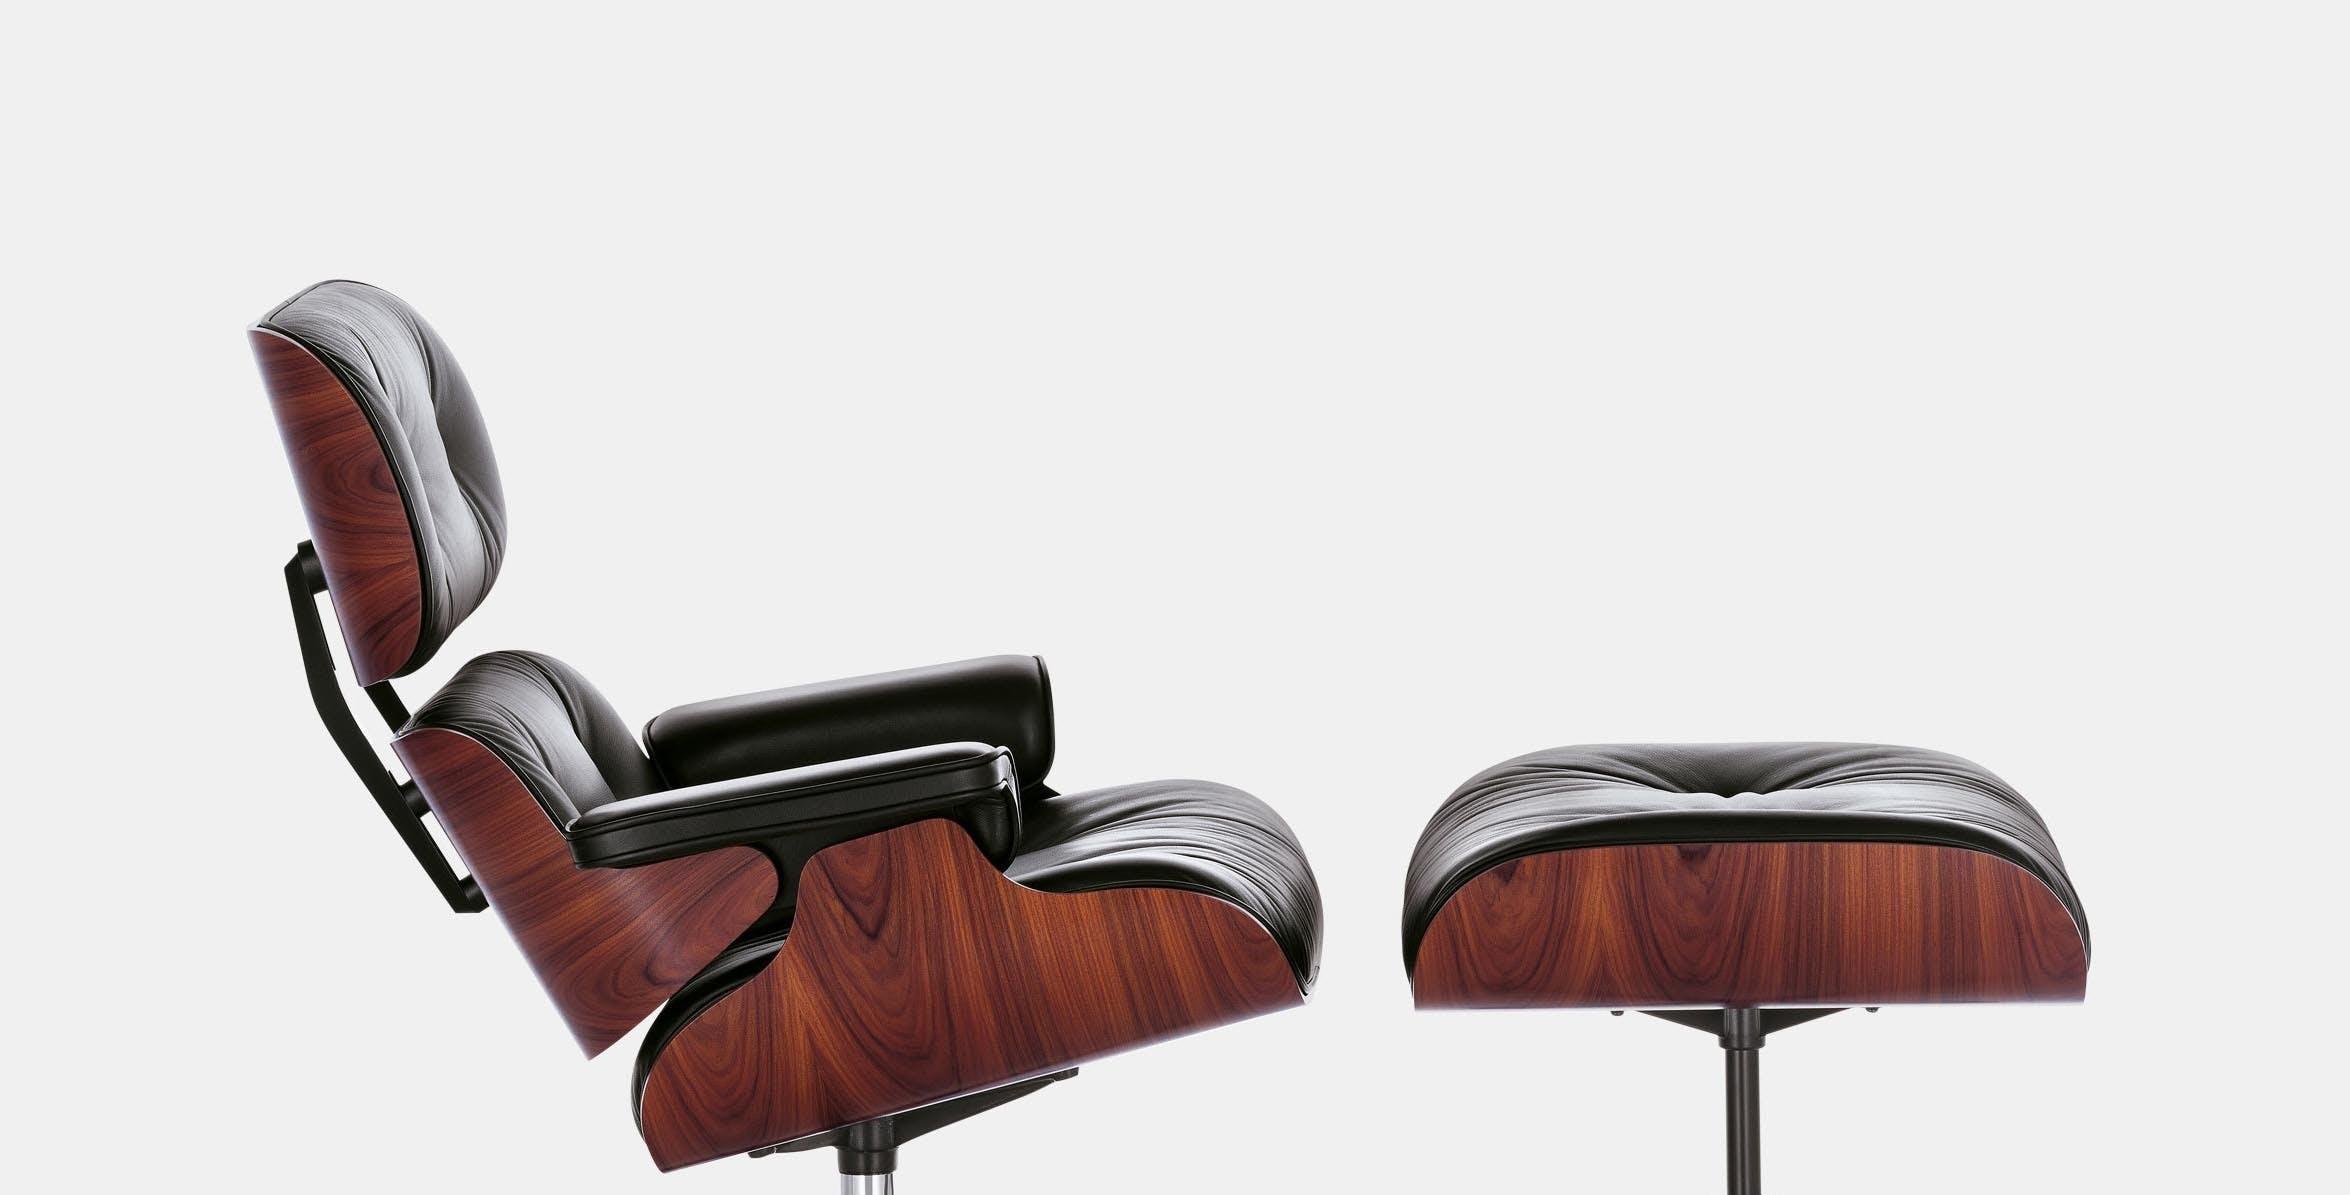 Designer Charles Ray Eames